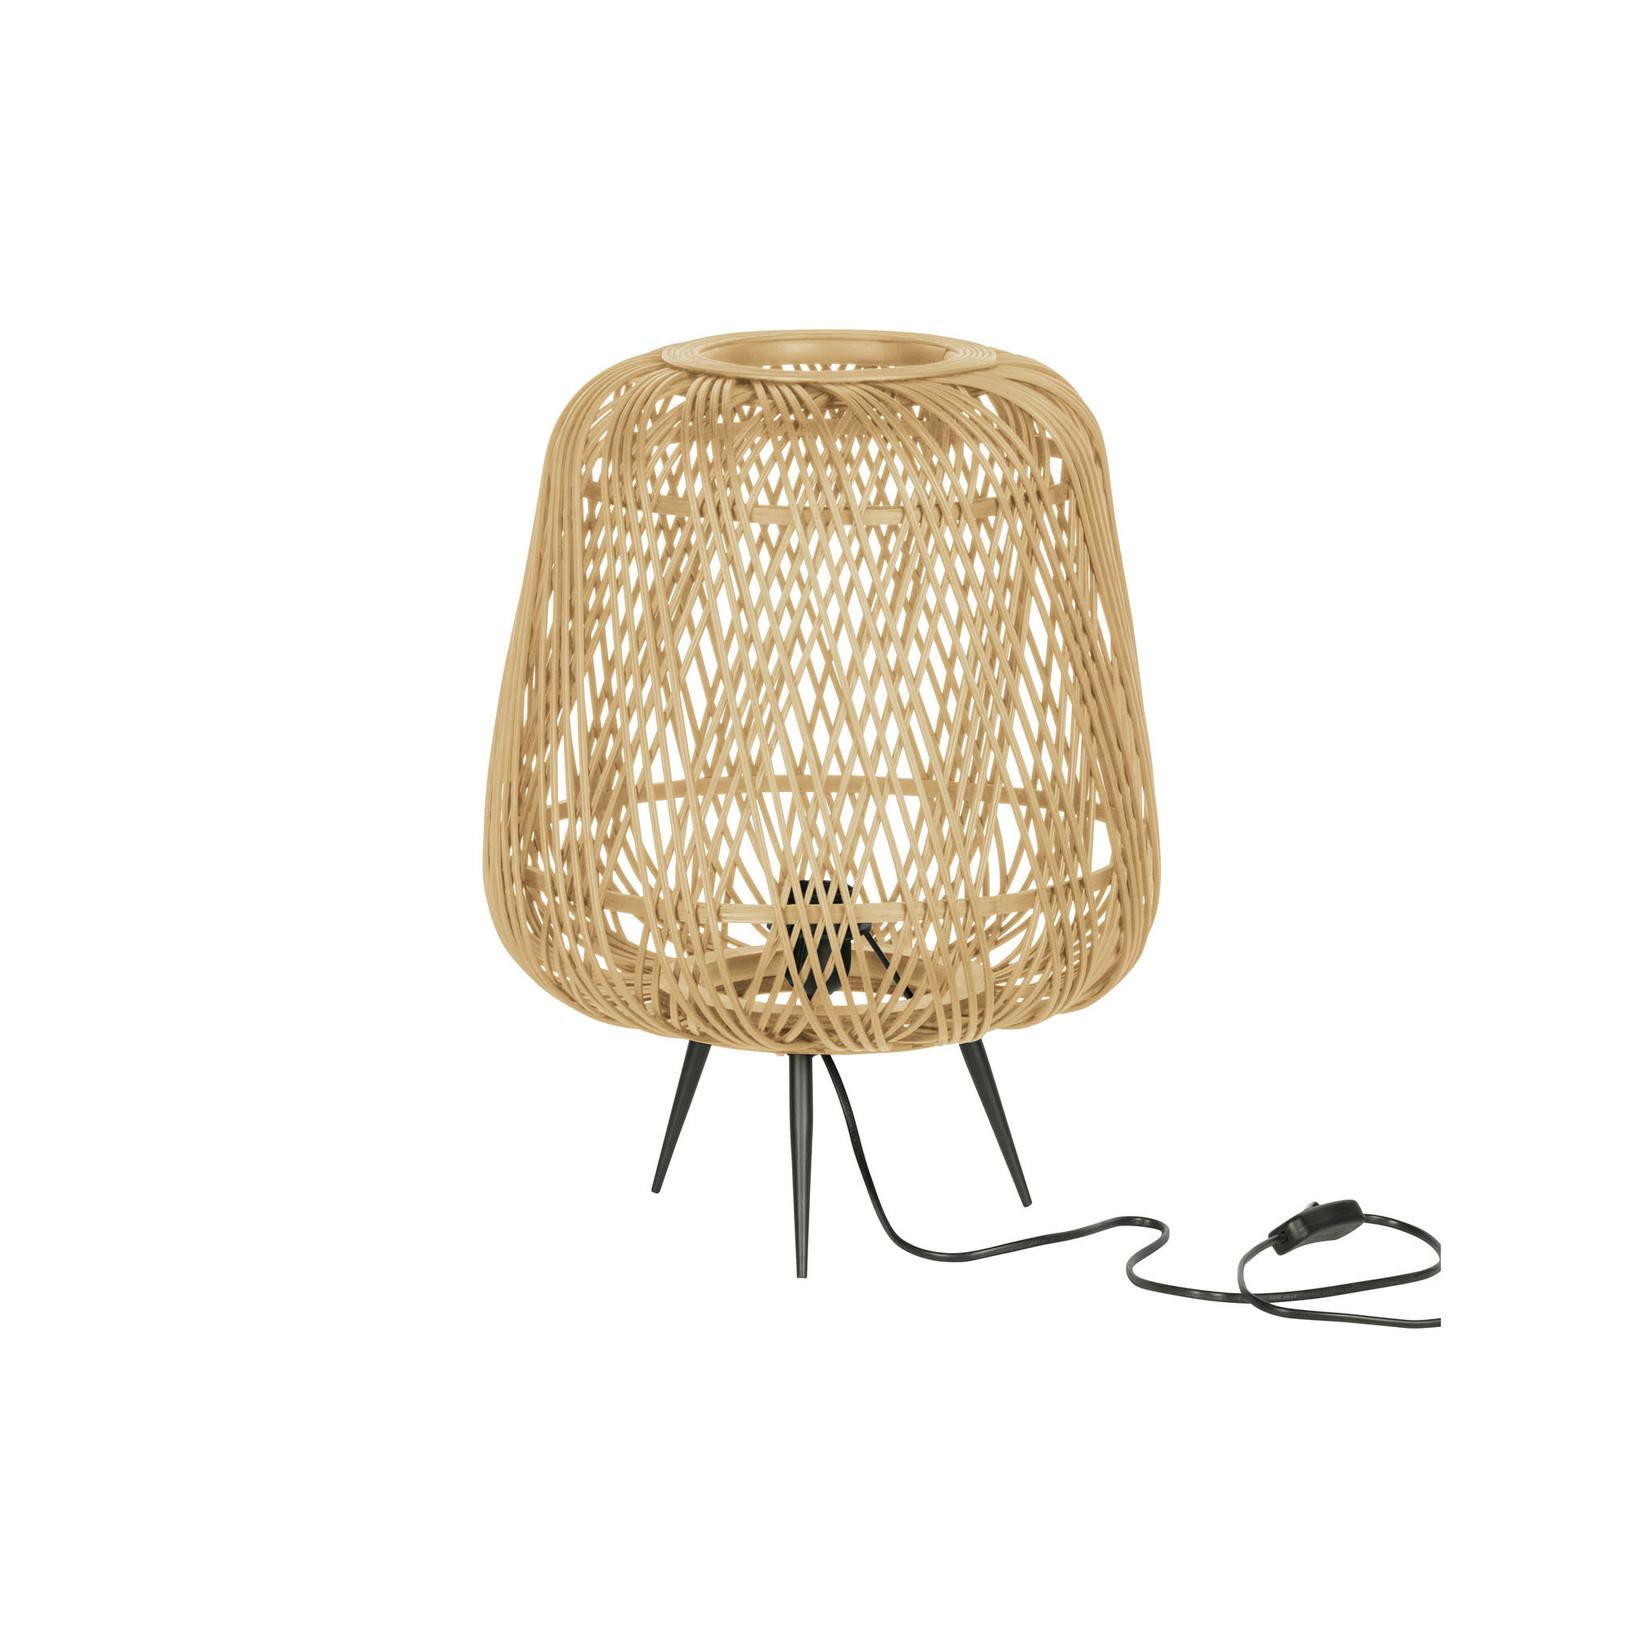 Woood Woood | Moza tafellamp bamboe naturel